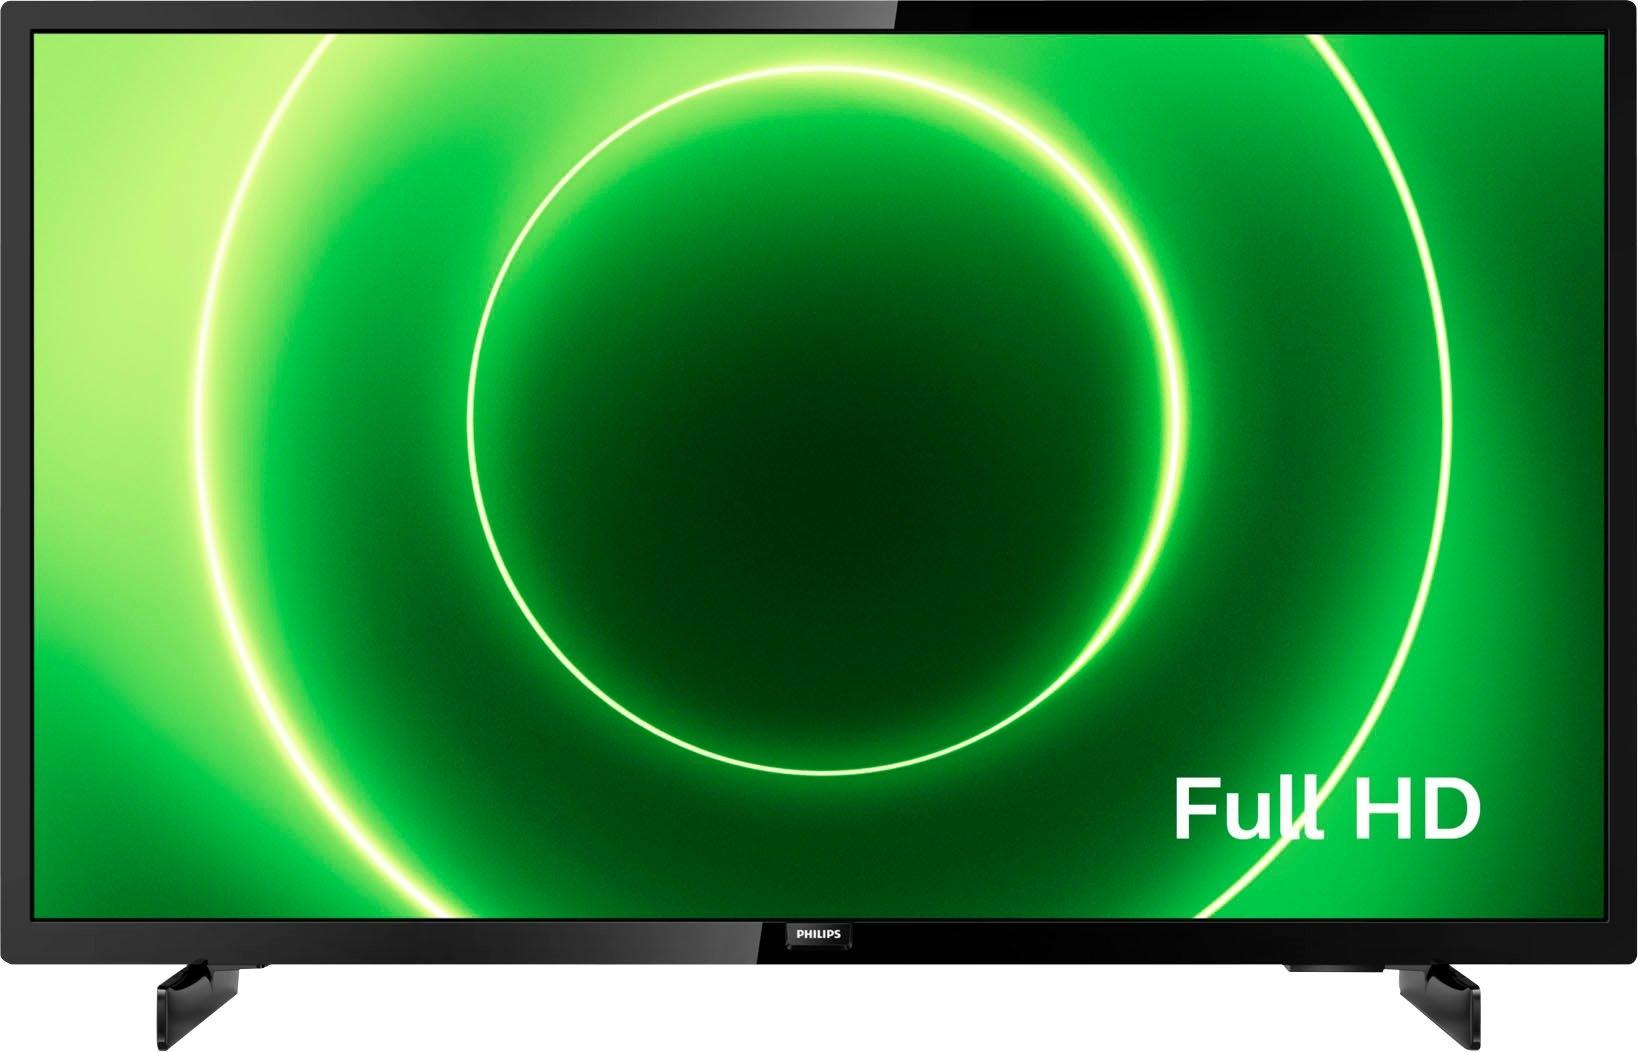 Philips LED-TV 32PFS6805/12, 80 cm / 32